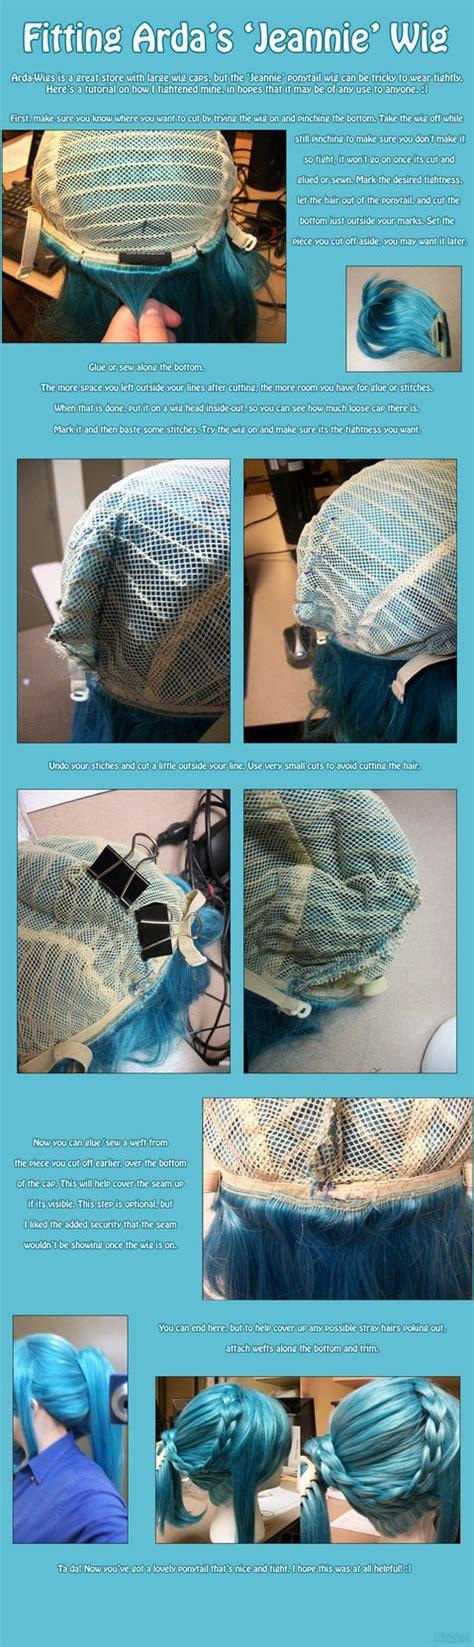 tutorial wig fitting arda s jeannie wig tutorial by prettykitty on